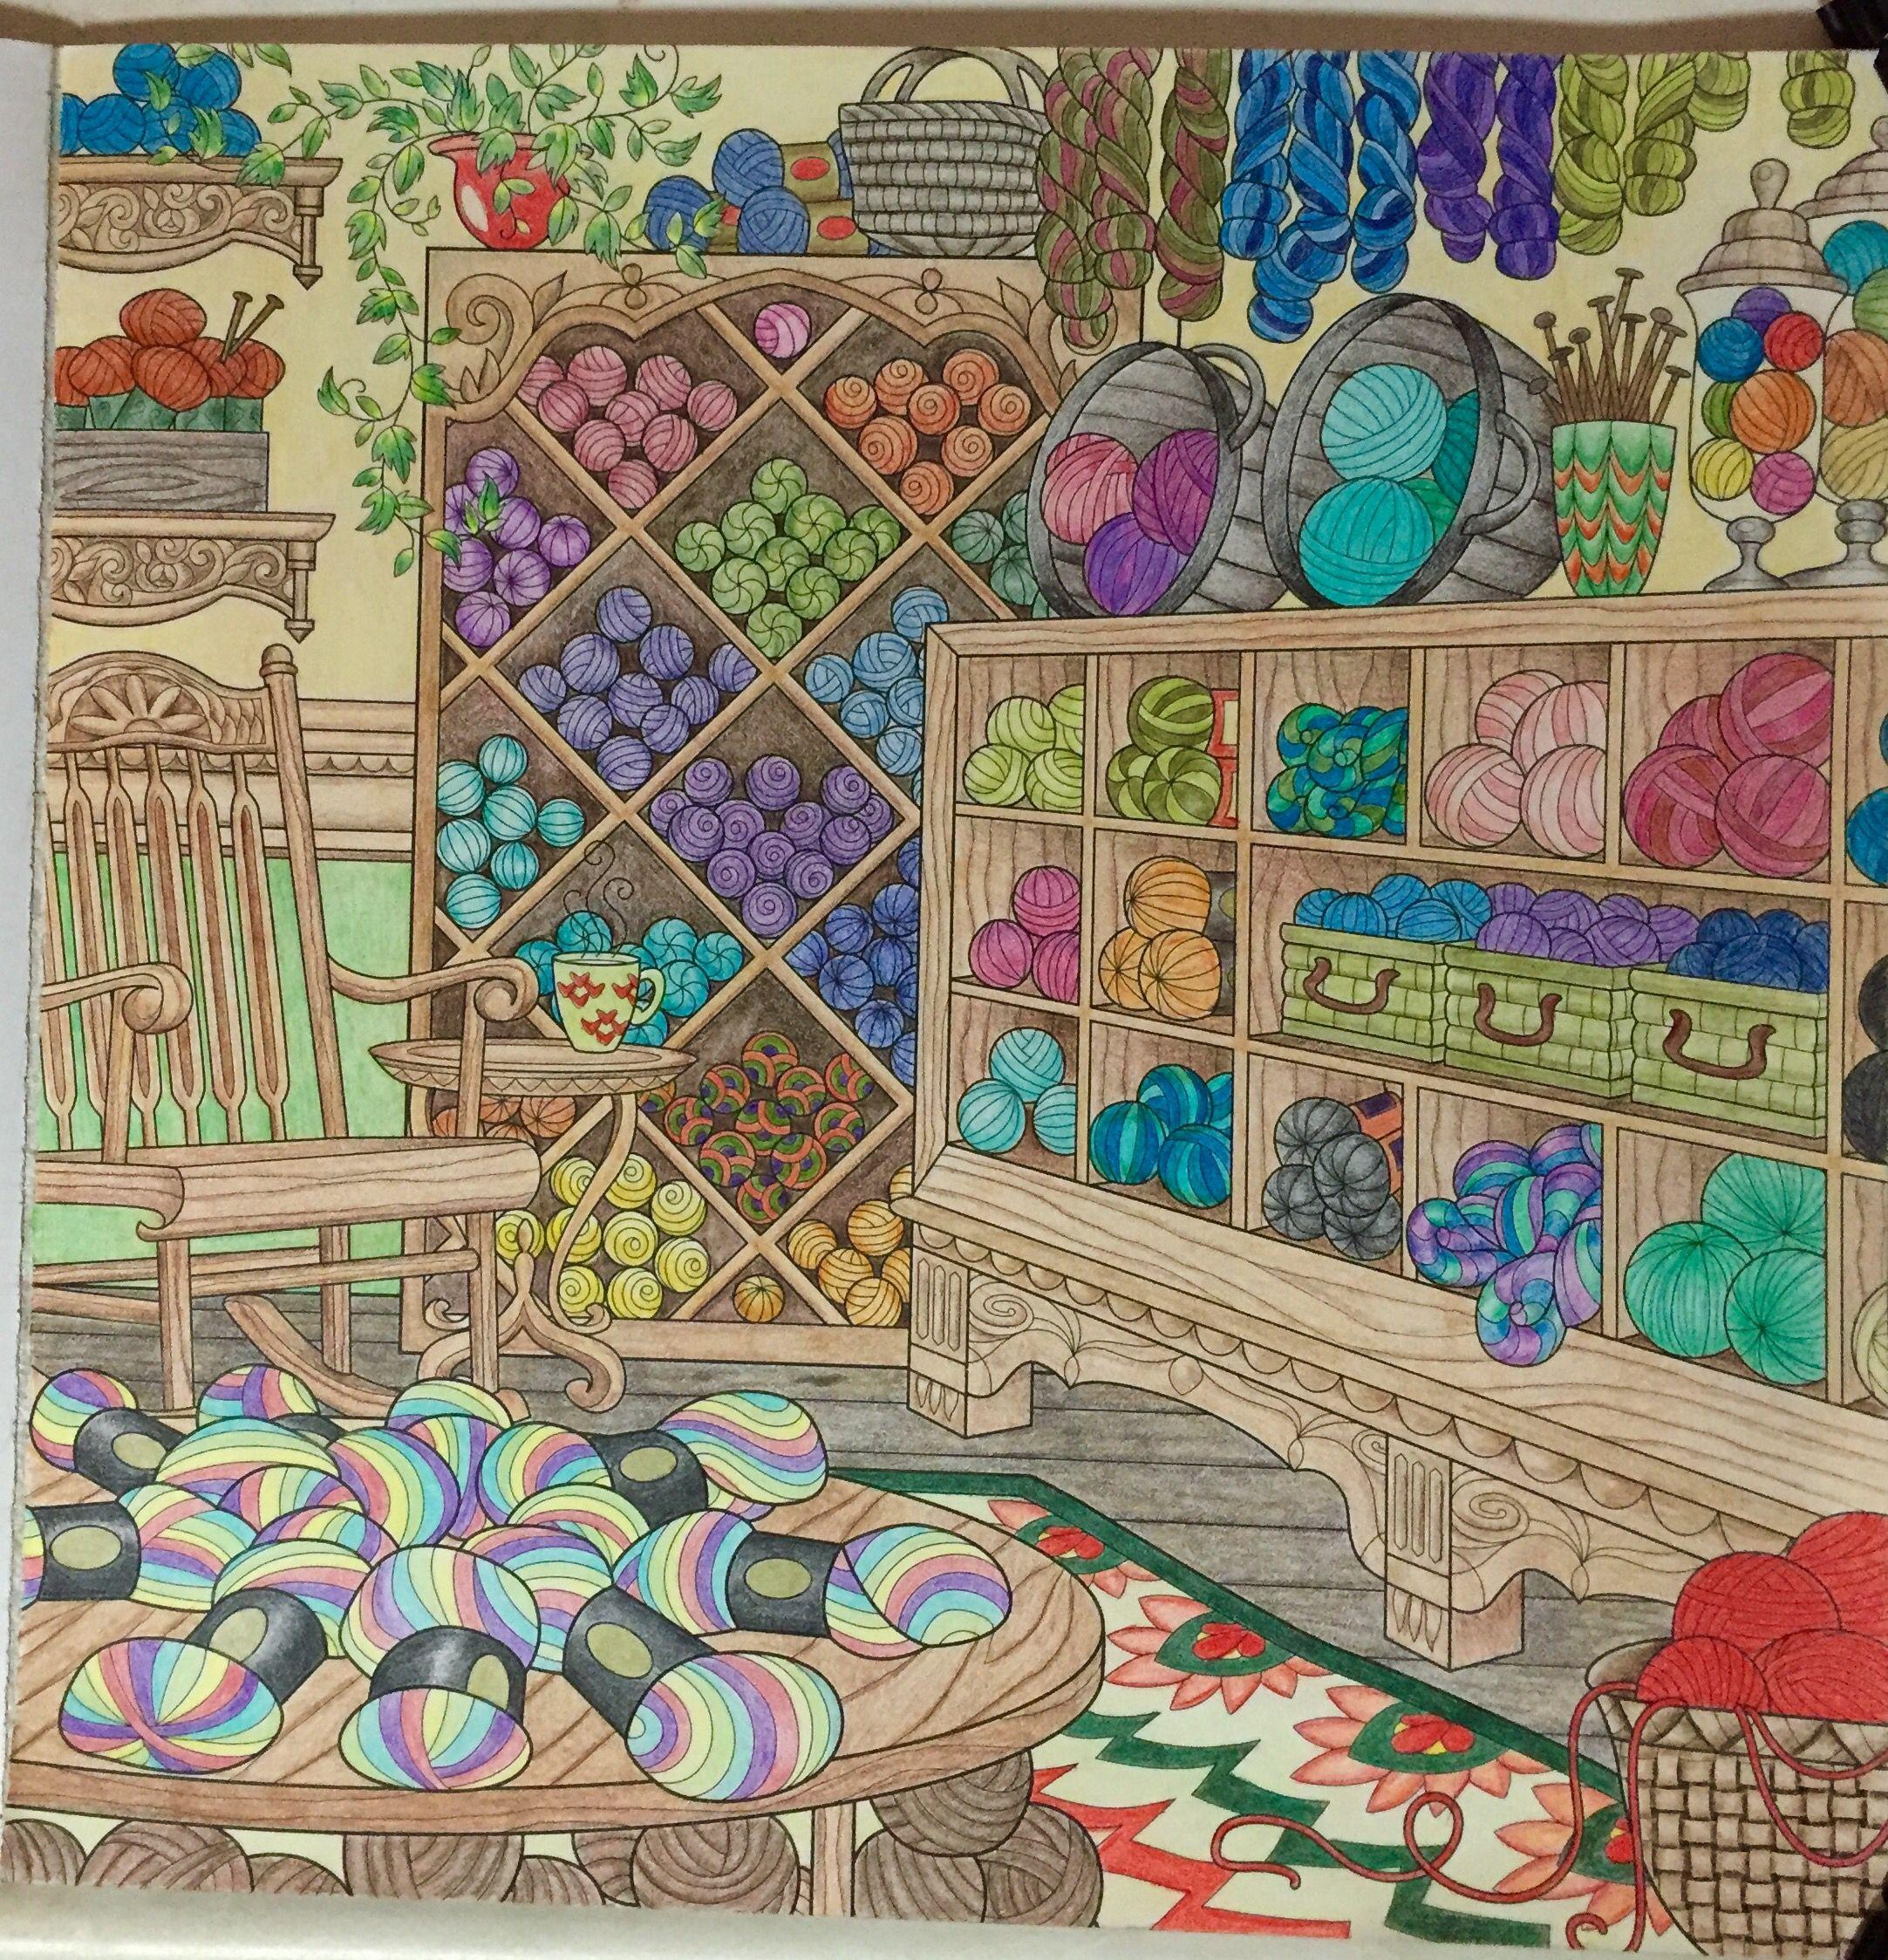 Debbie Macomber Debbie Macomber Coloring Book Coloring Book Art Coloring Books